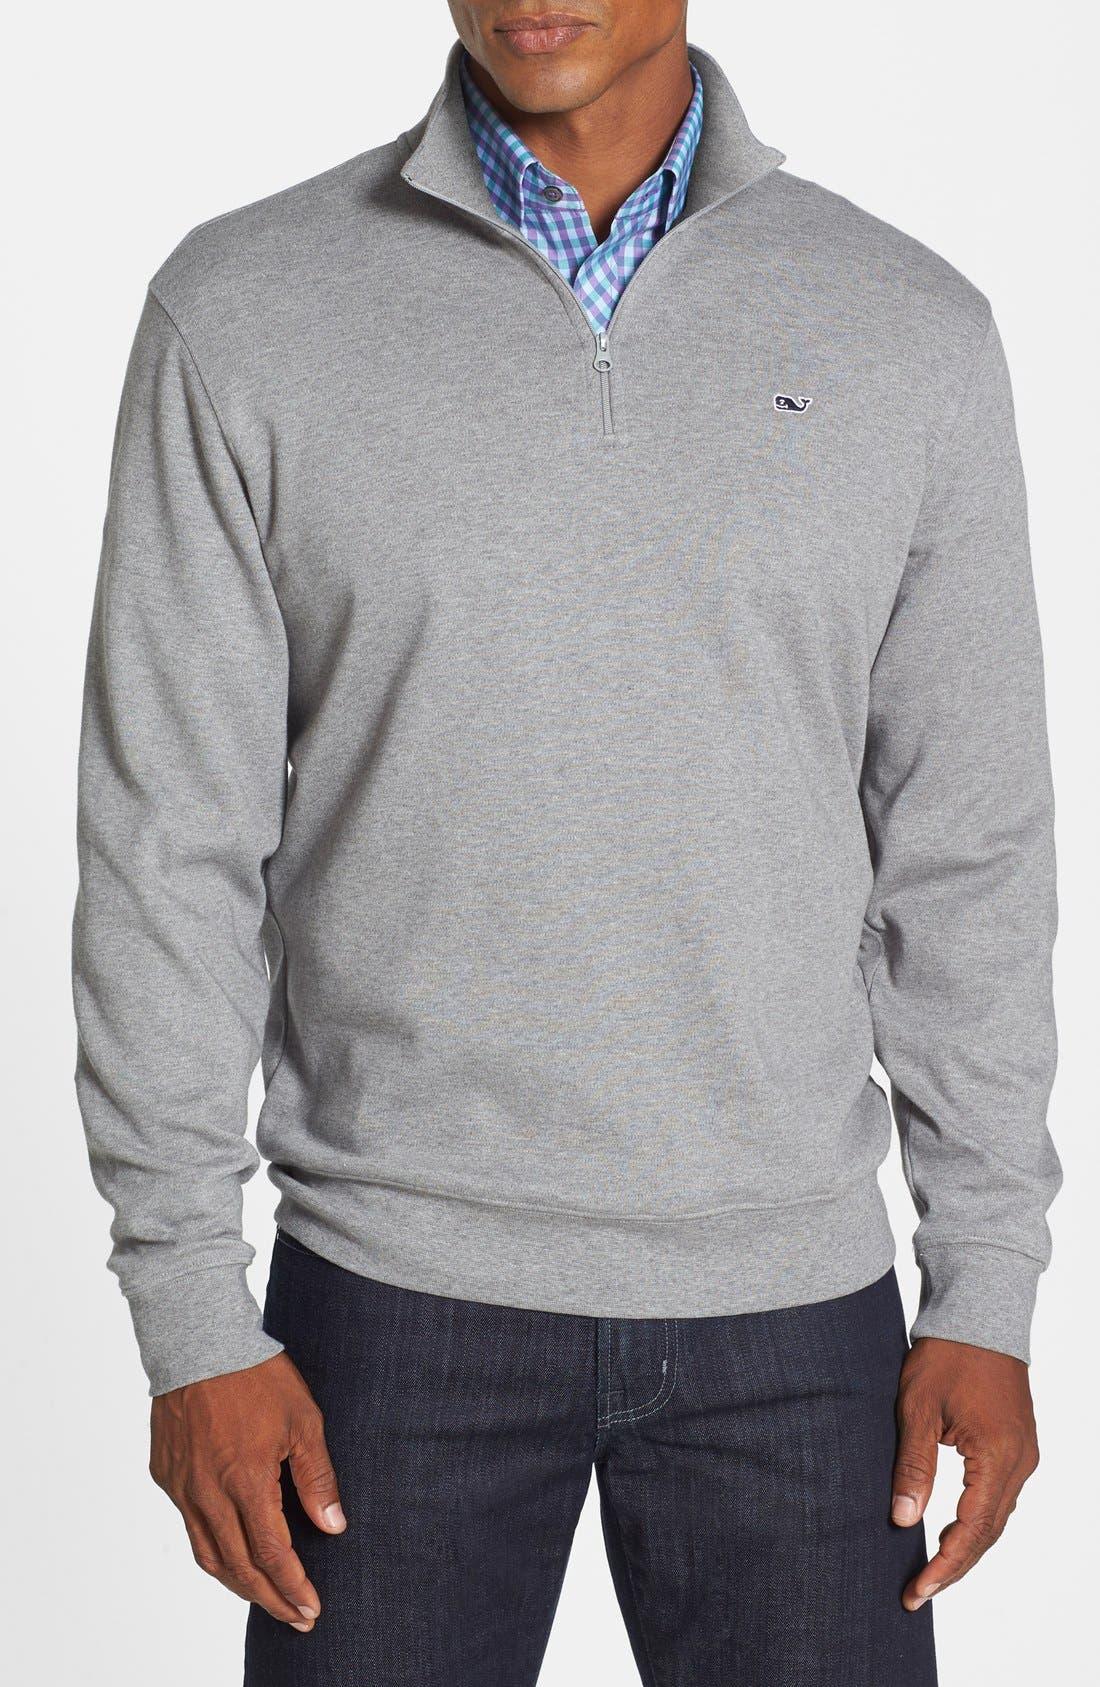 Quarter Zip Cotton Jersey Sweatshirt, Main, color, 020